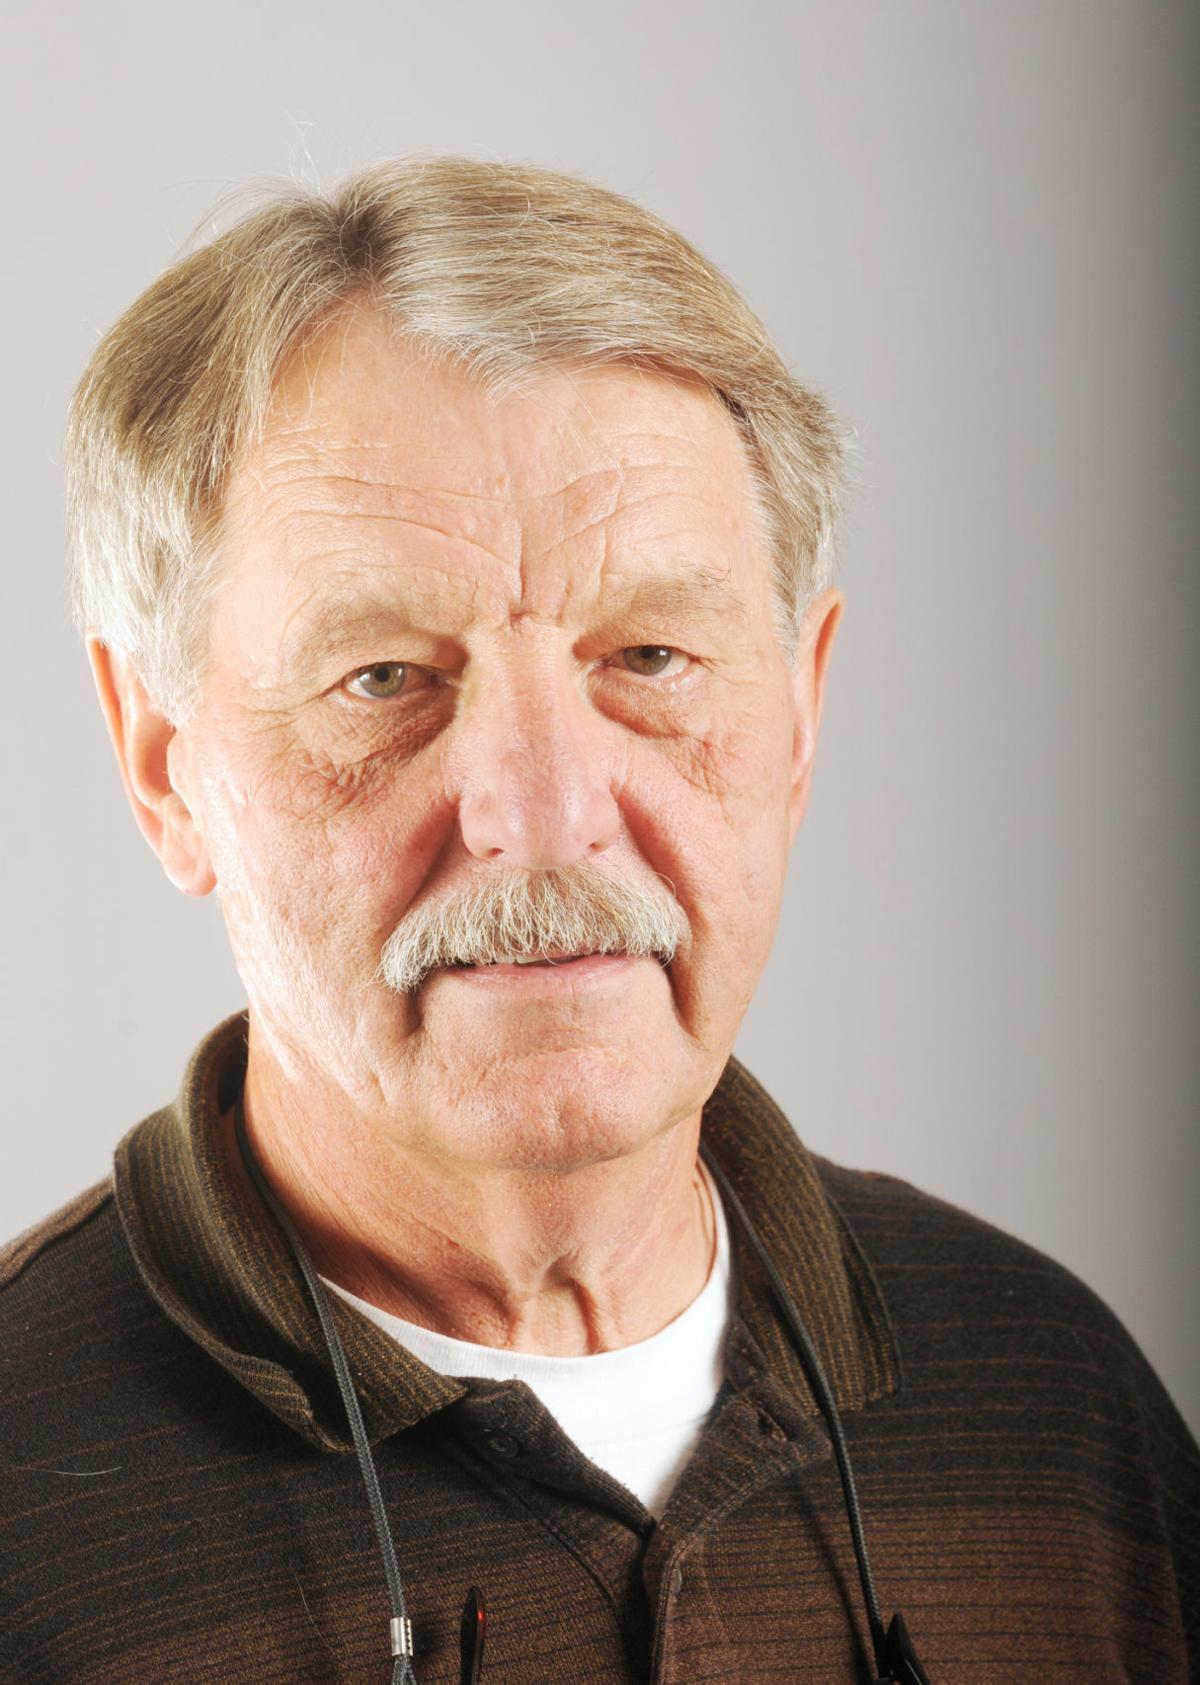 Rudy Evenson